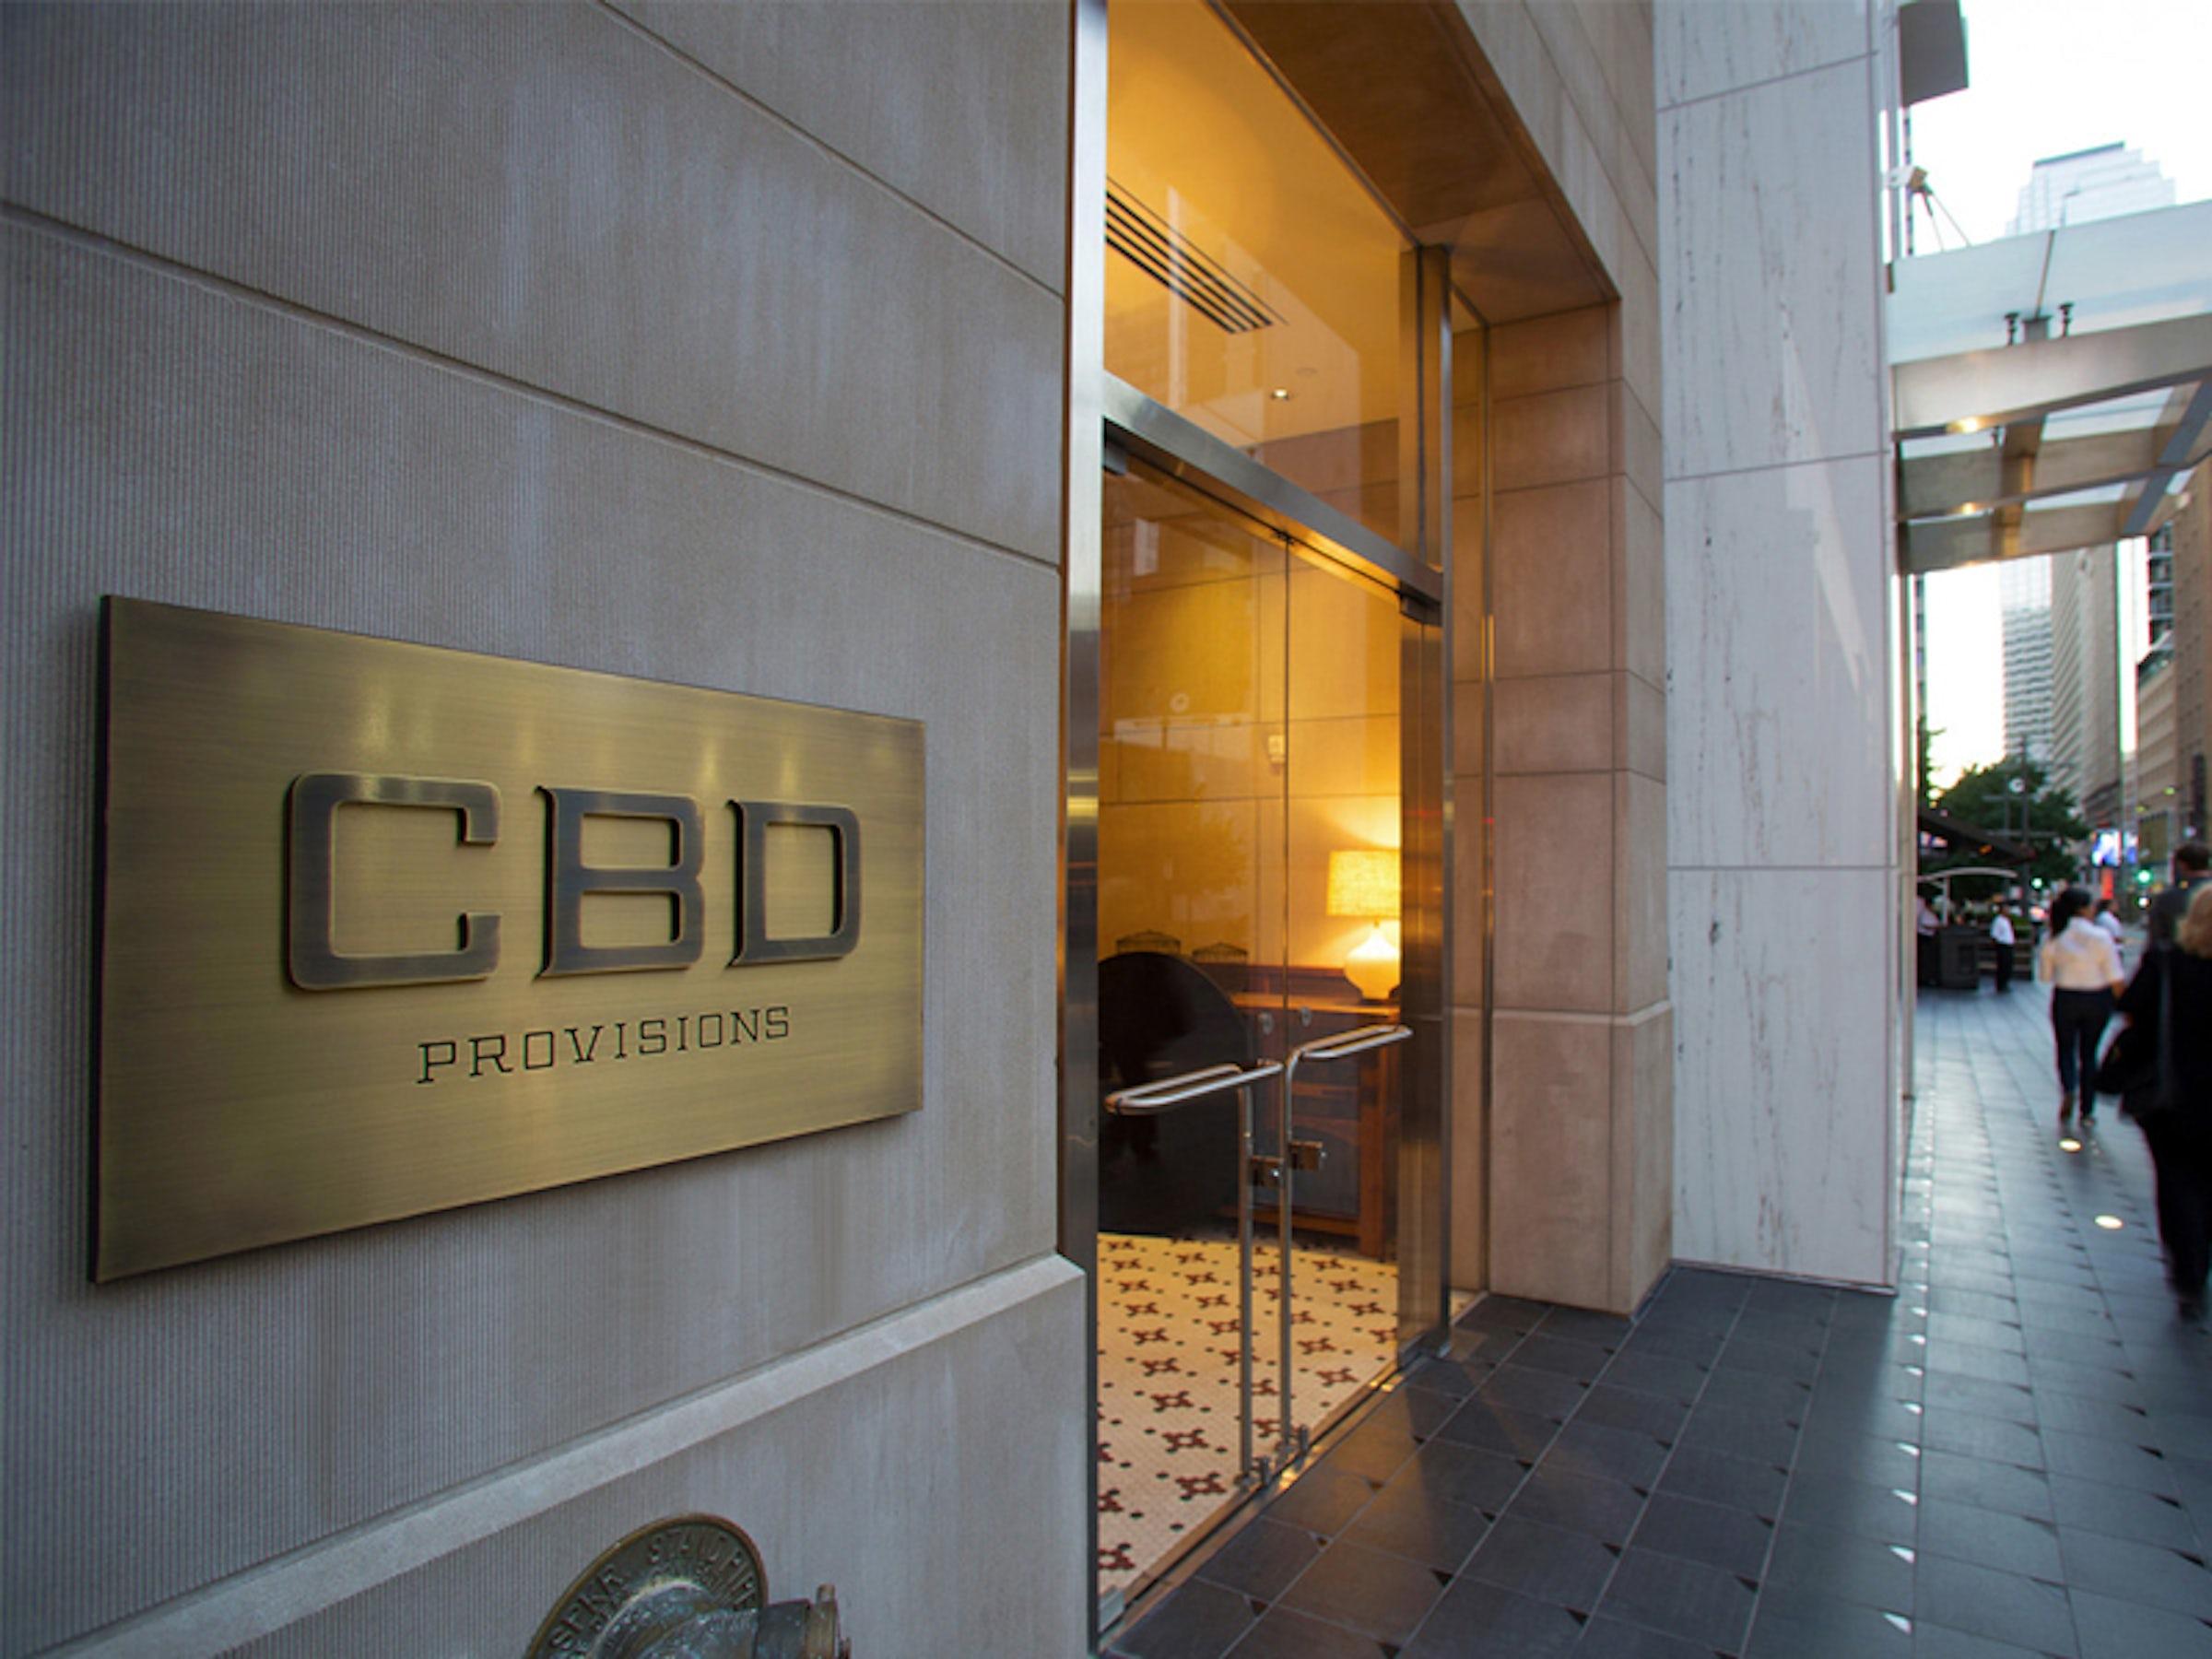 CBD Provisions in Beyond Dallas